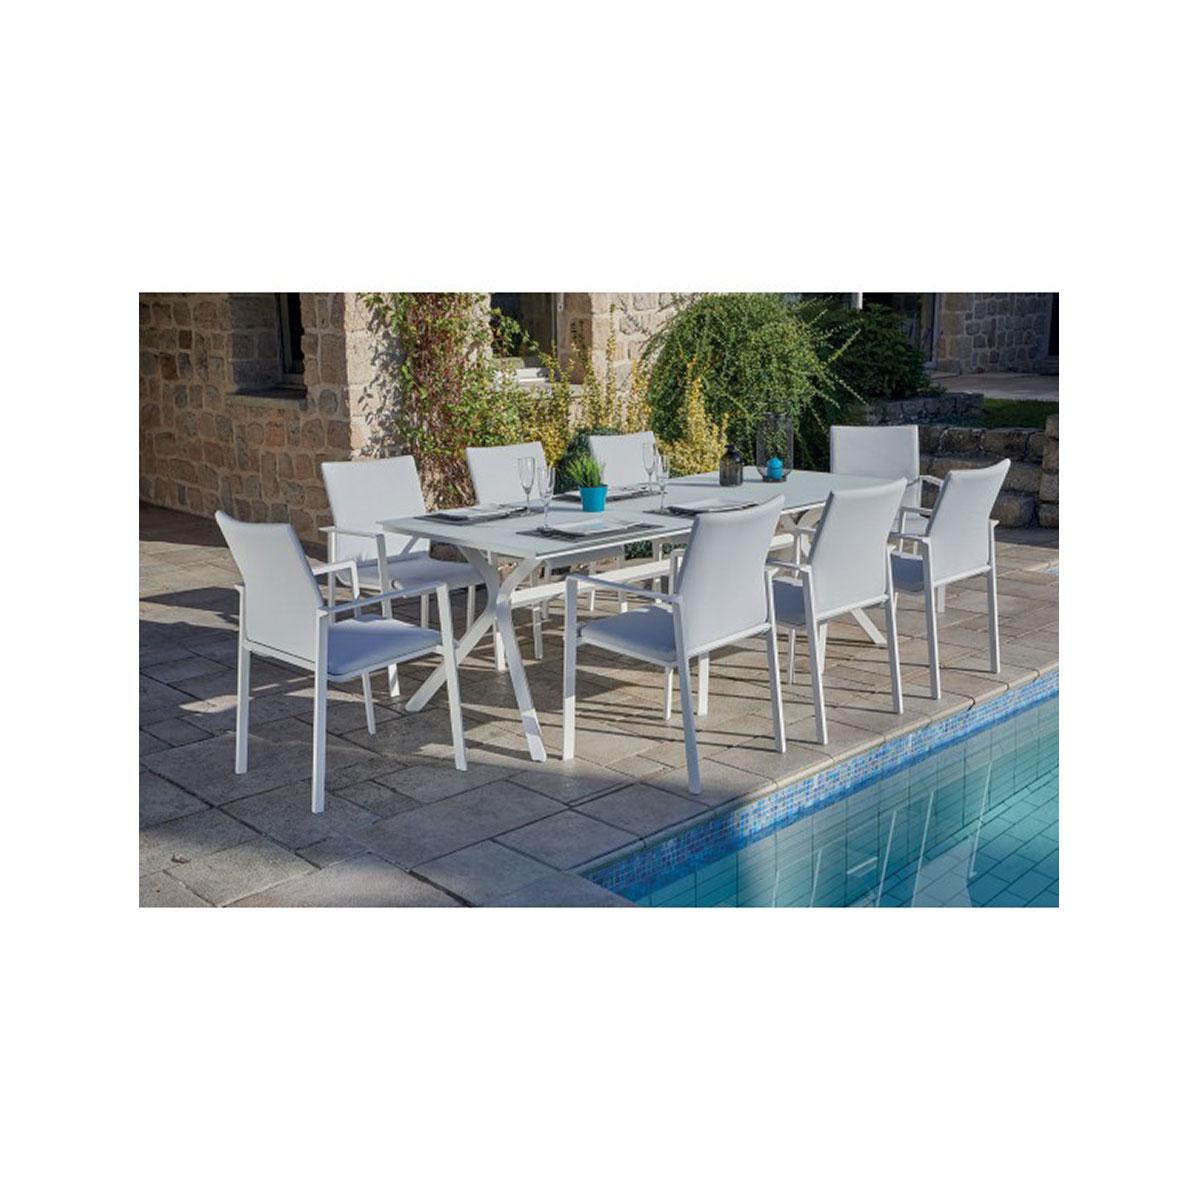 Salon de jardin blanc avec pied design - Blanc - 220 x 90 x 75 cm